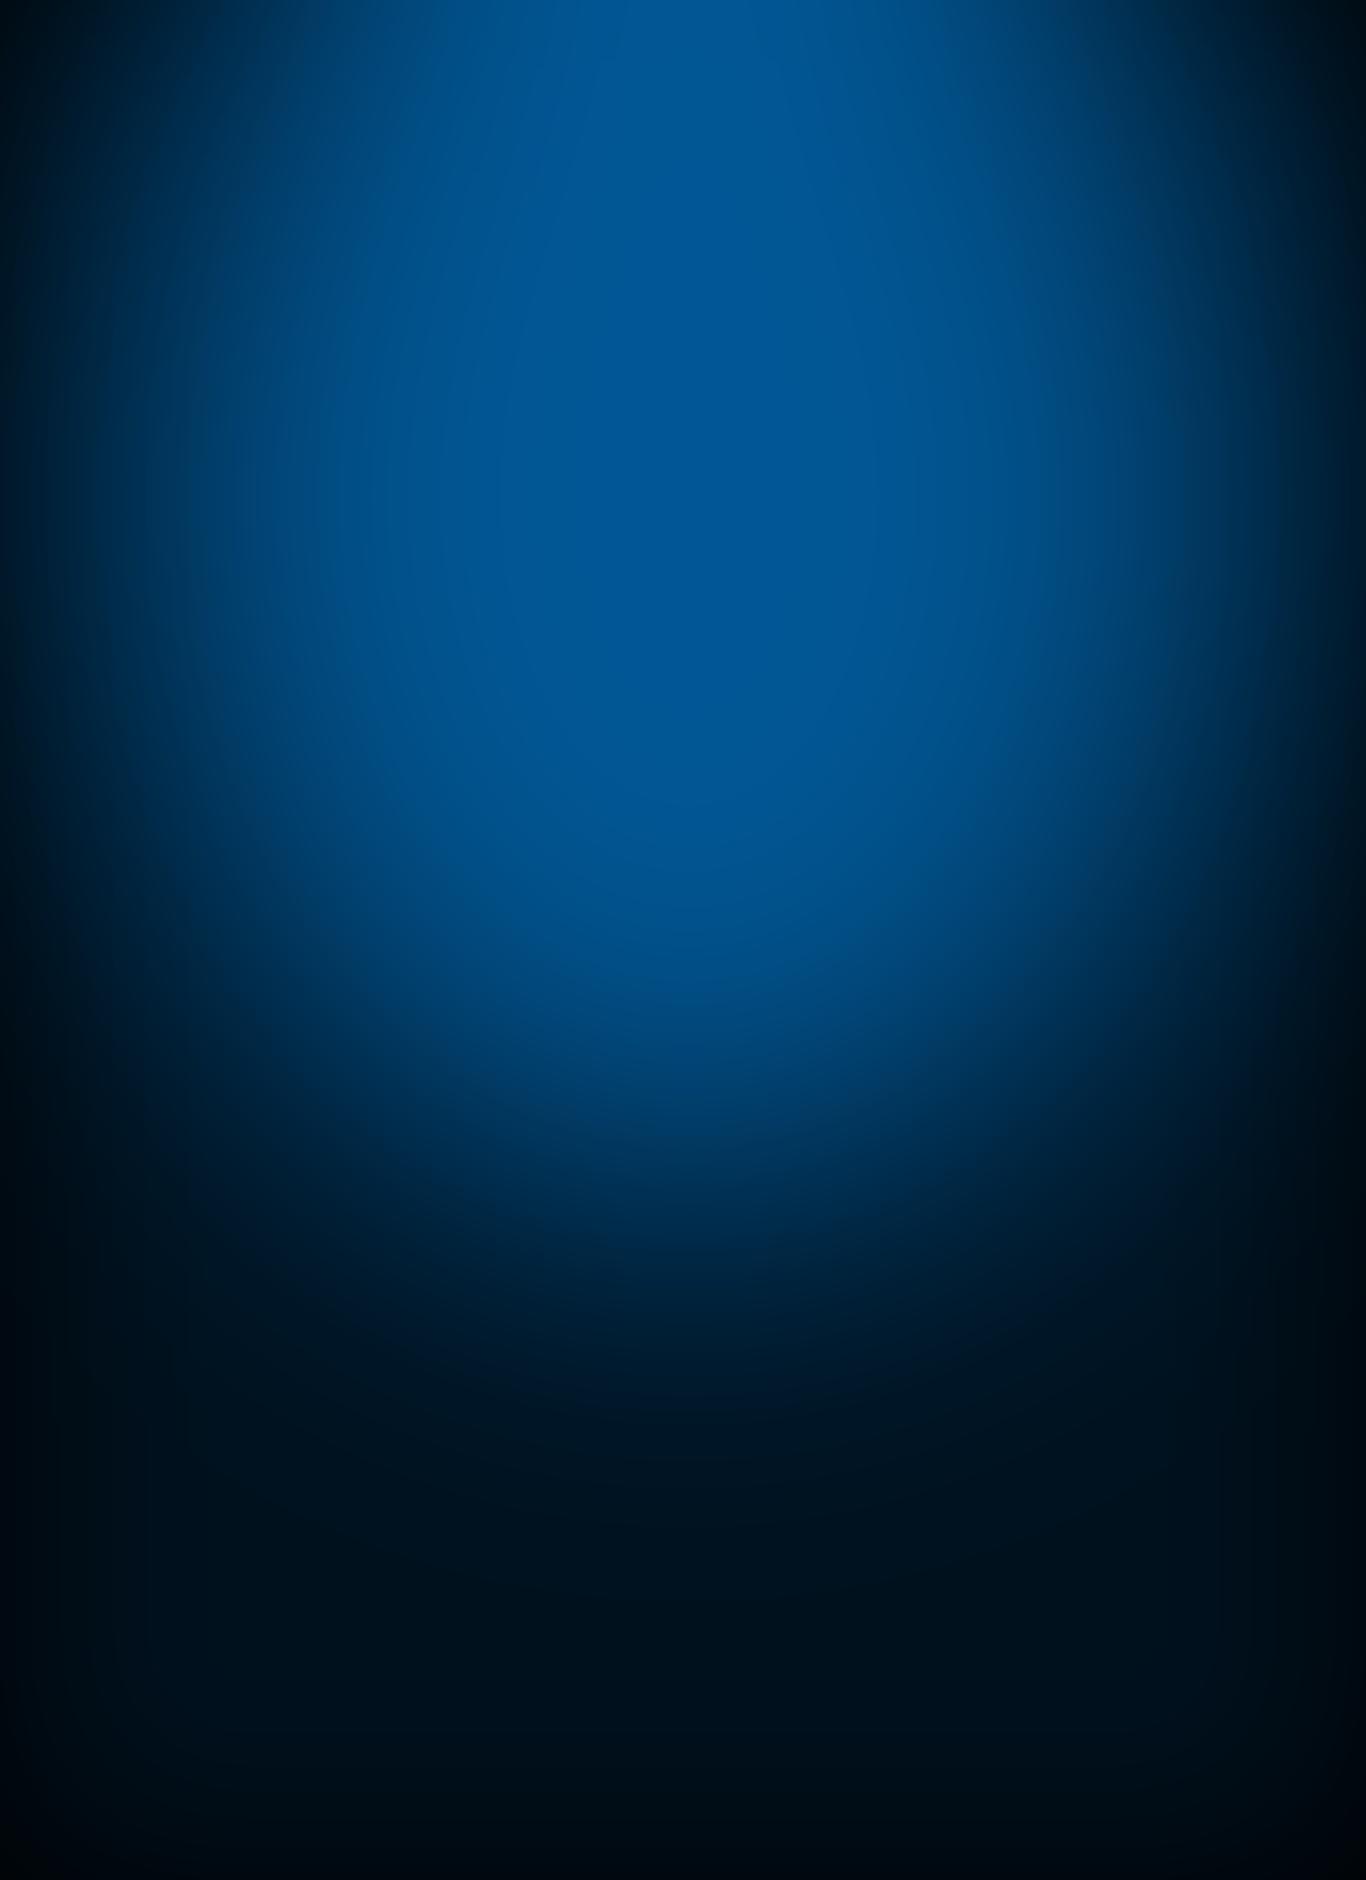 App background png 5 » PNG Image.